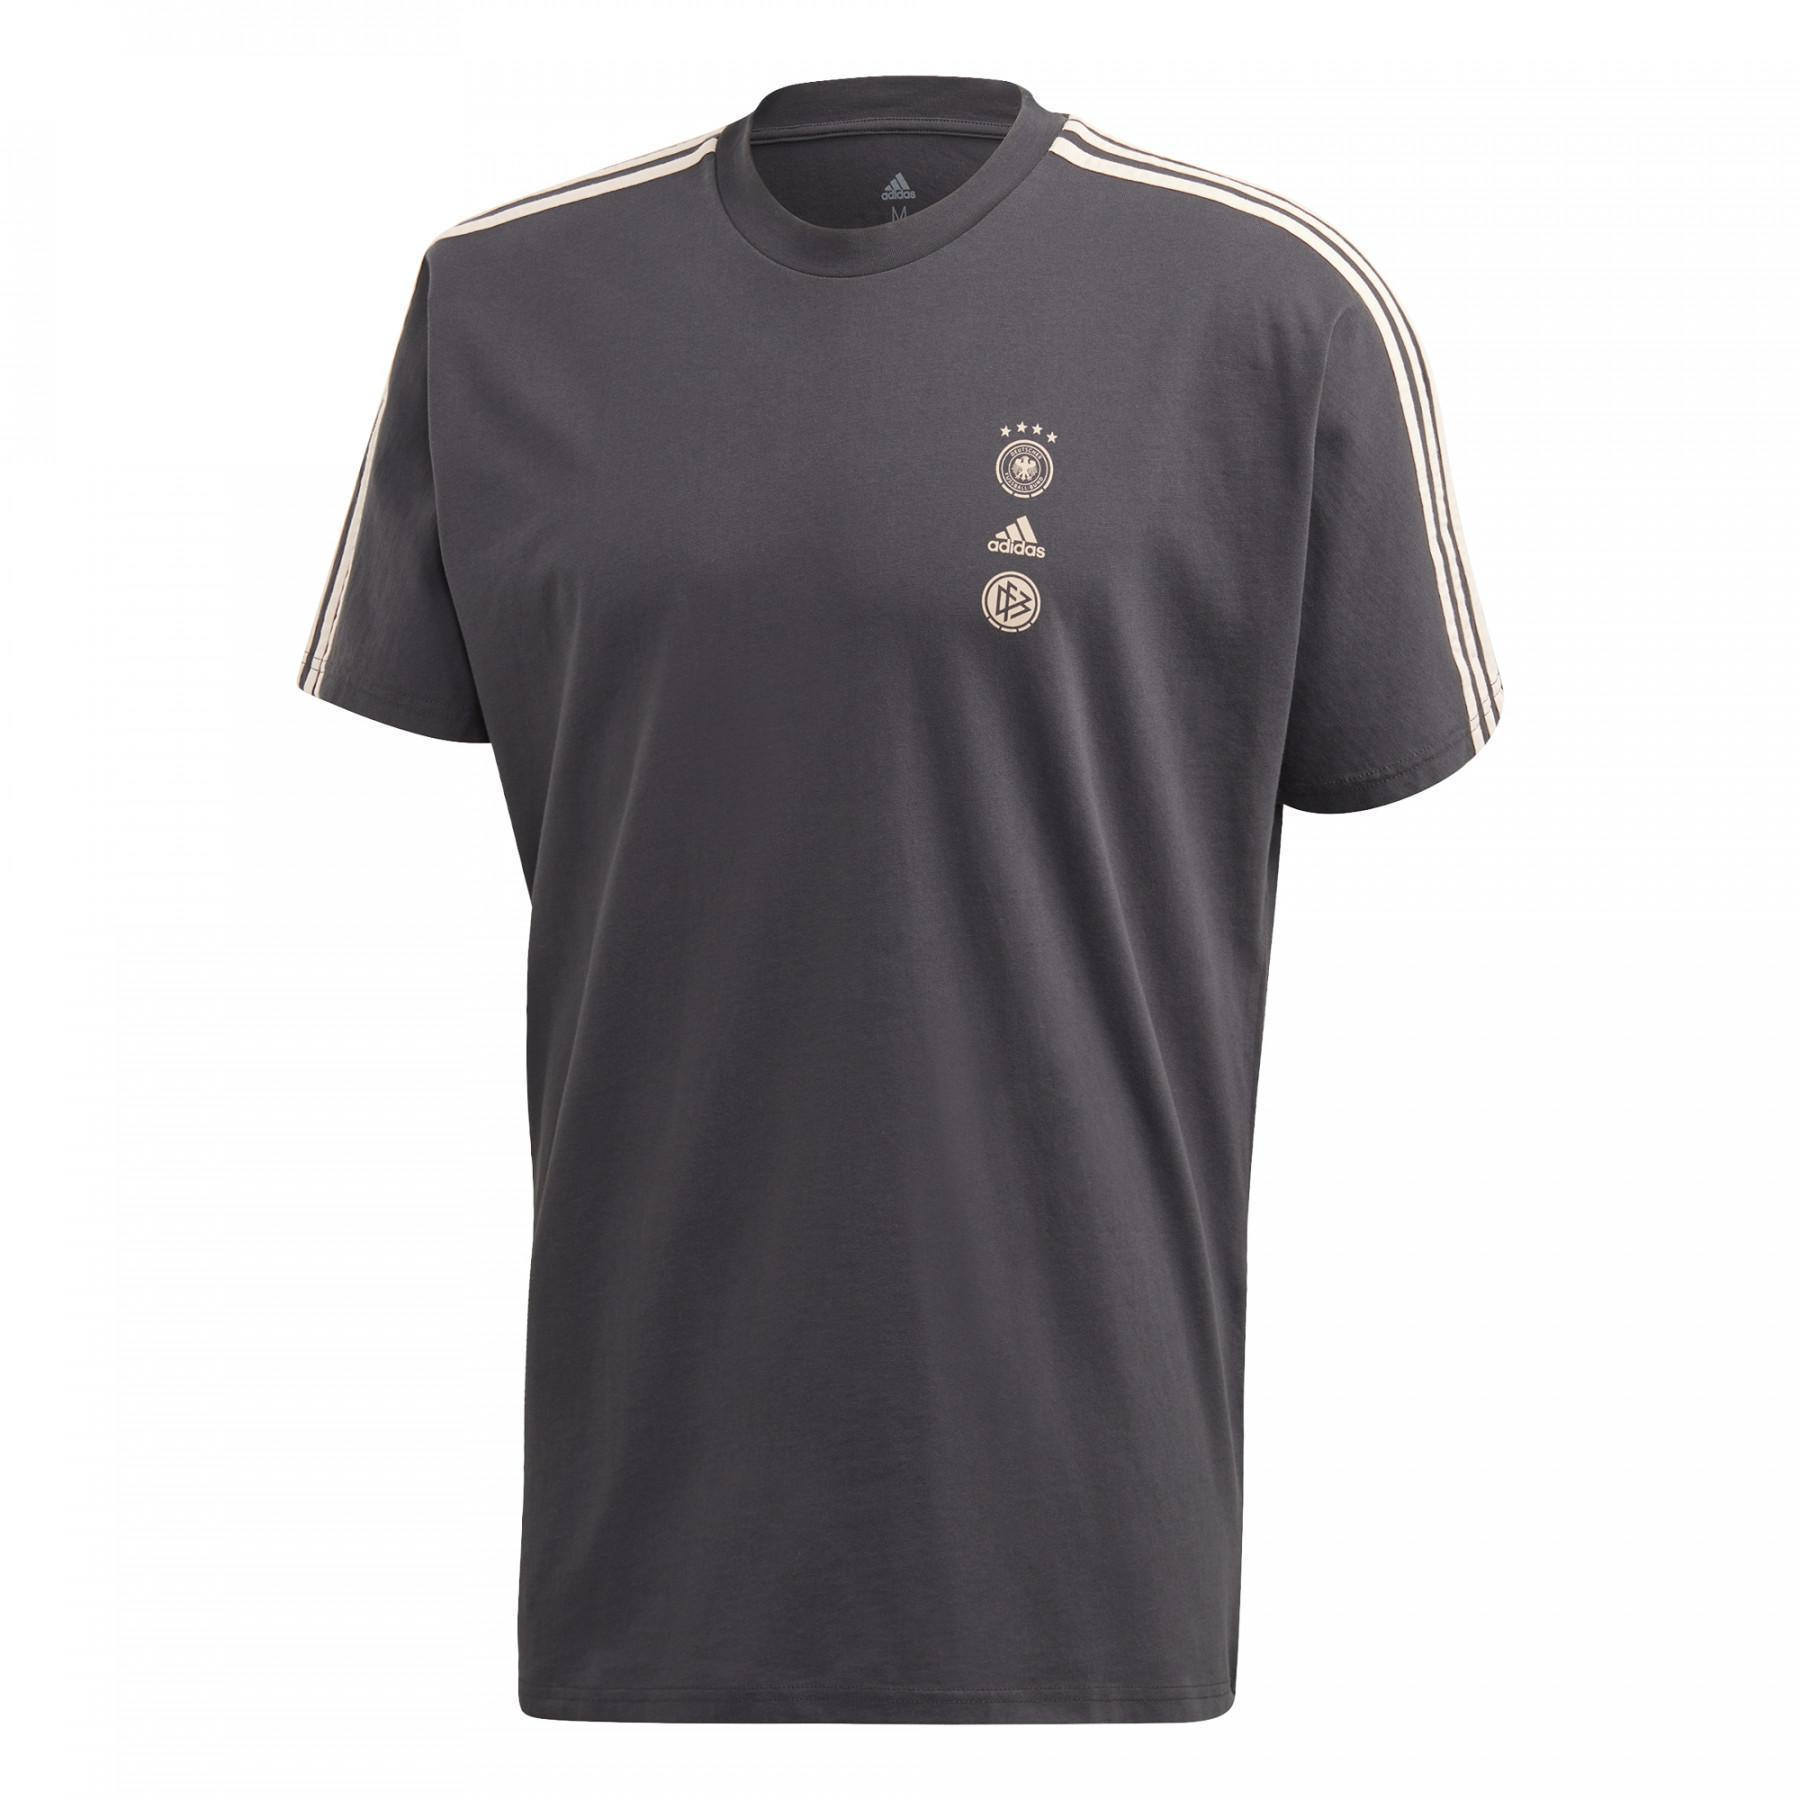 Shirt Germany Seasonal Special 2020